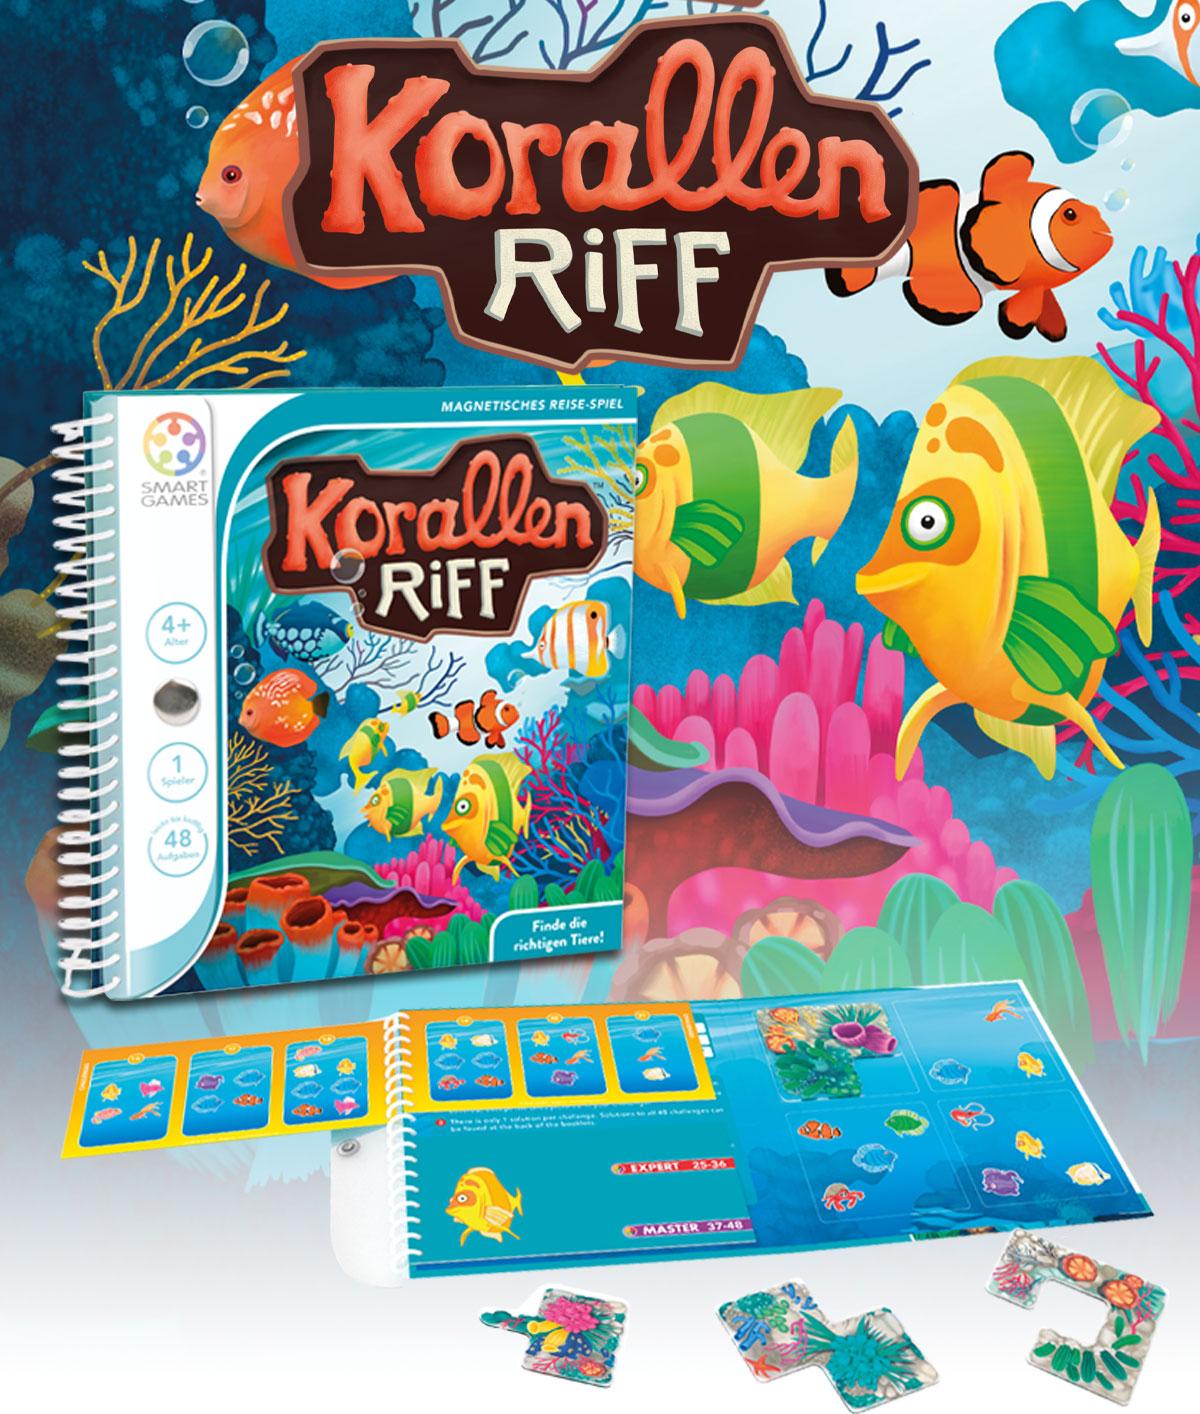 Korallen Riff